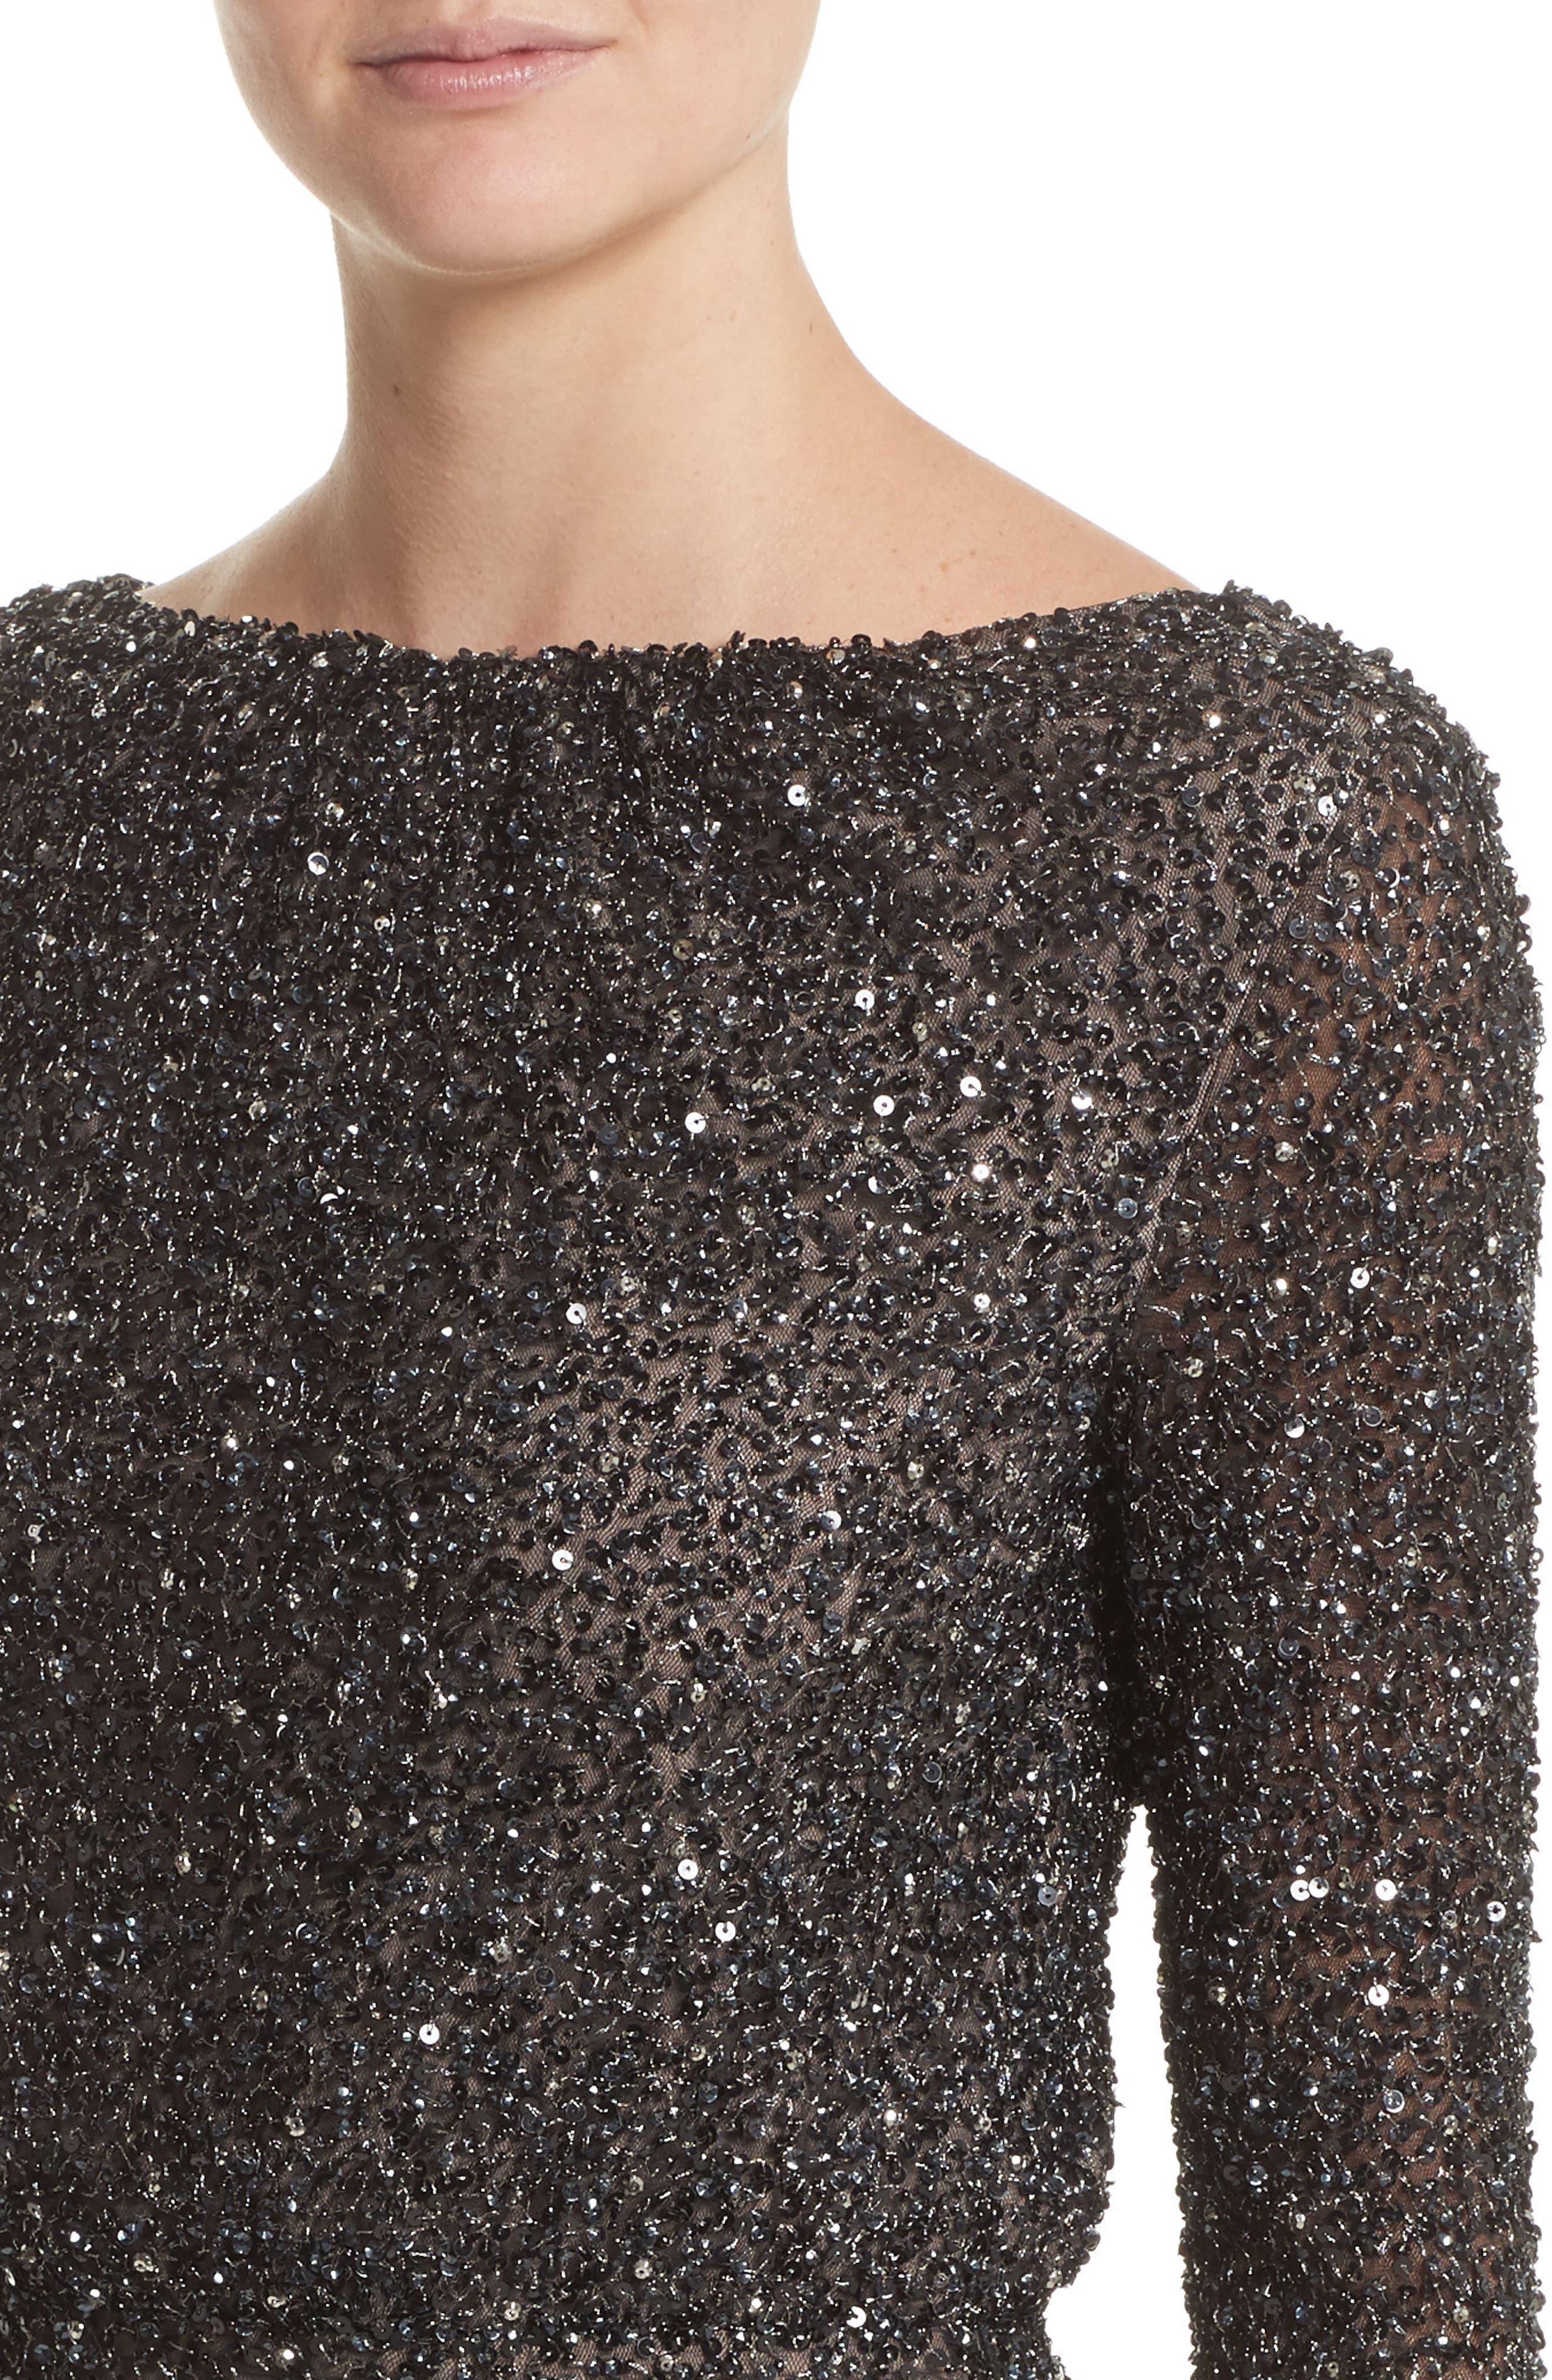 Viera Embellished V-Back Sheath Dress,                             Alternate thumbnail 4, color,                             001